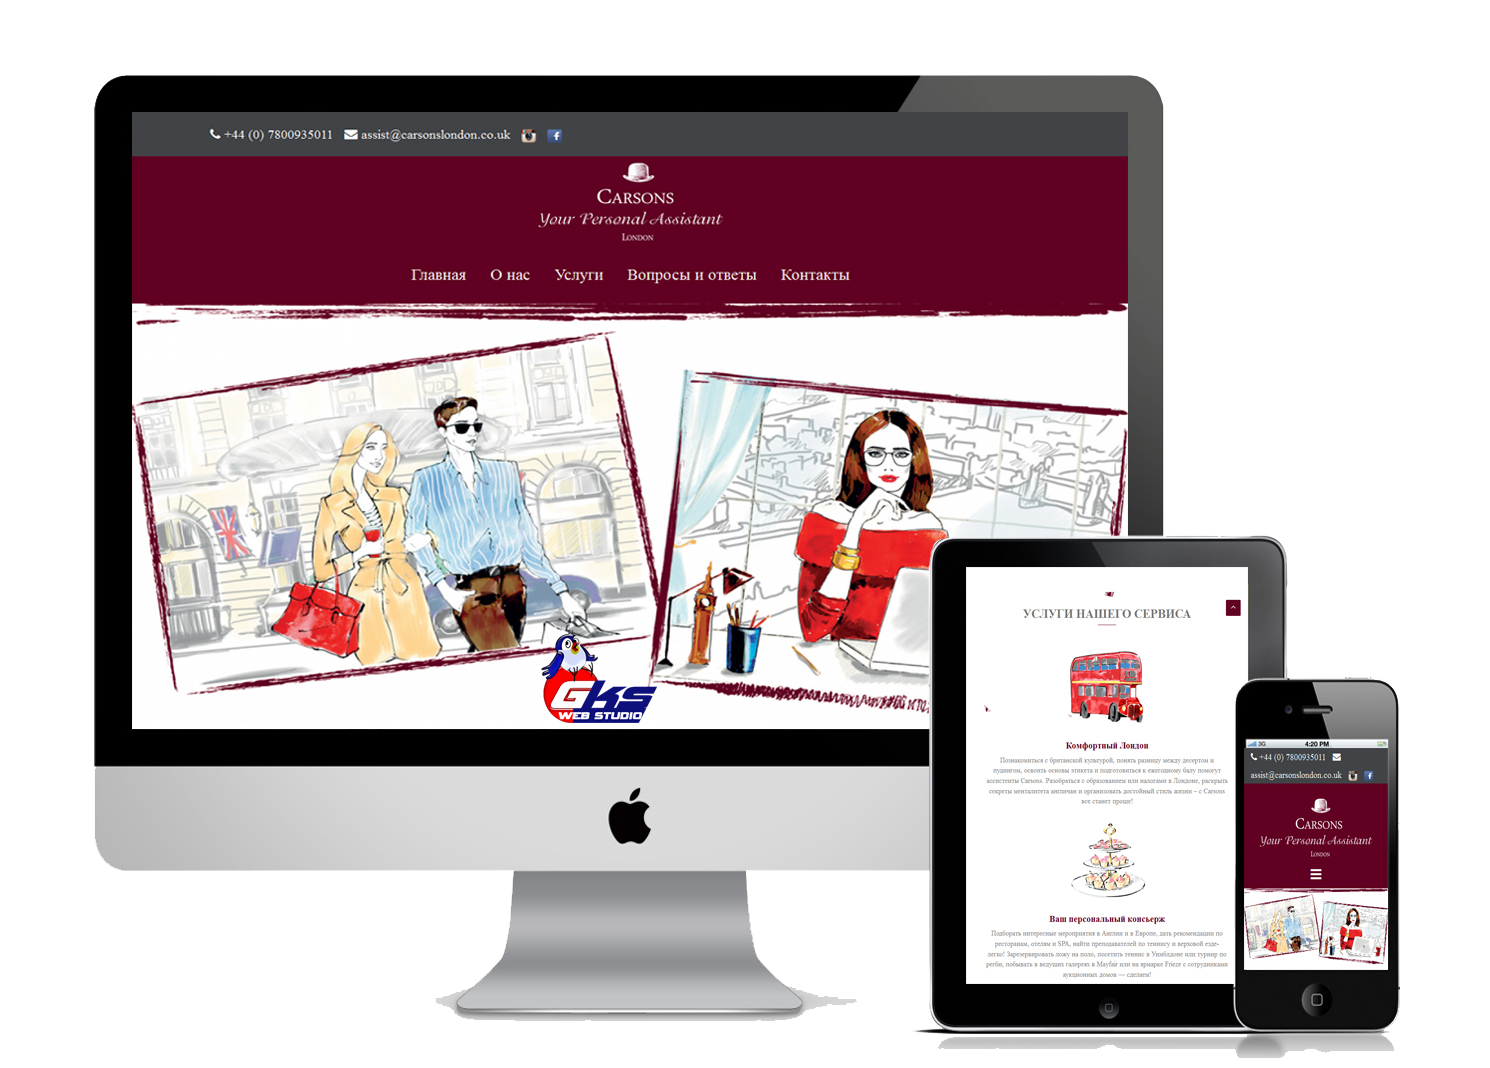 Создание сайта Carsons London